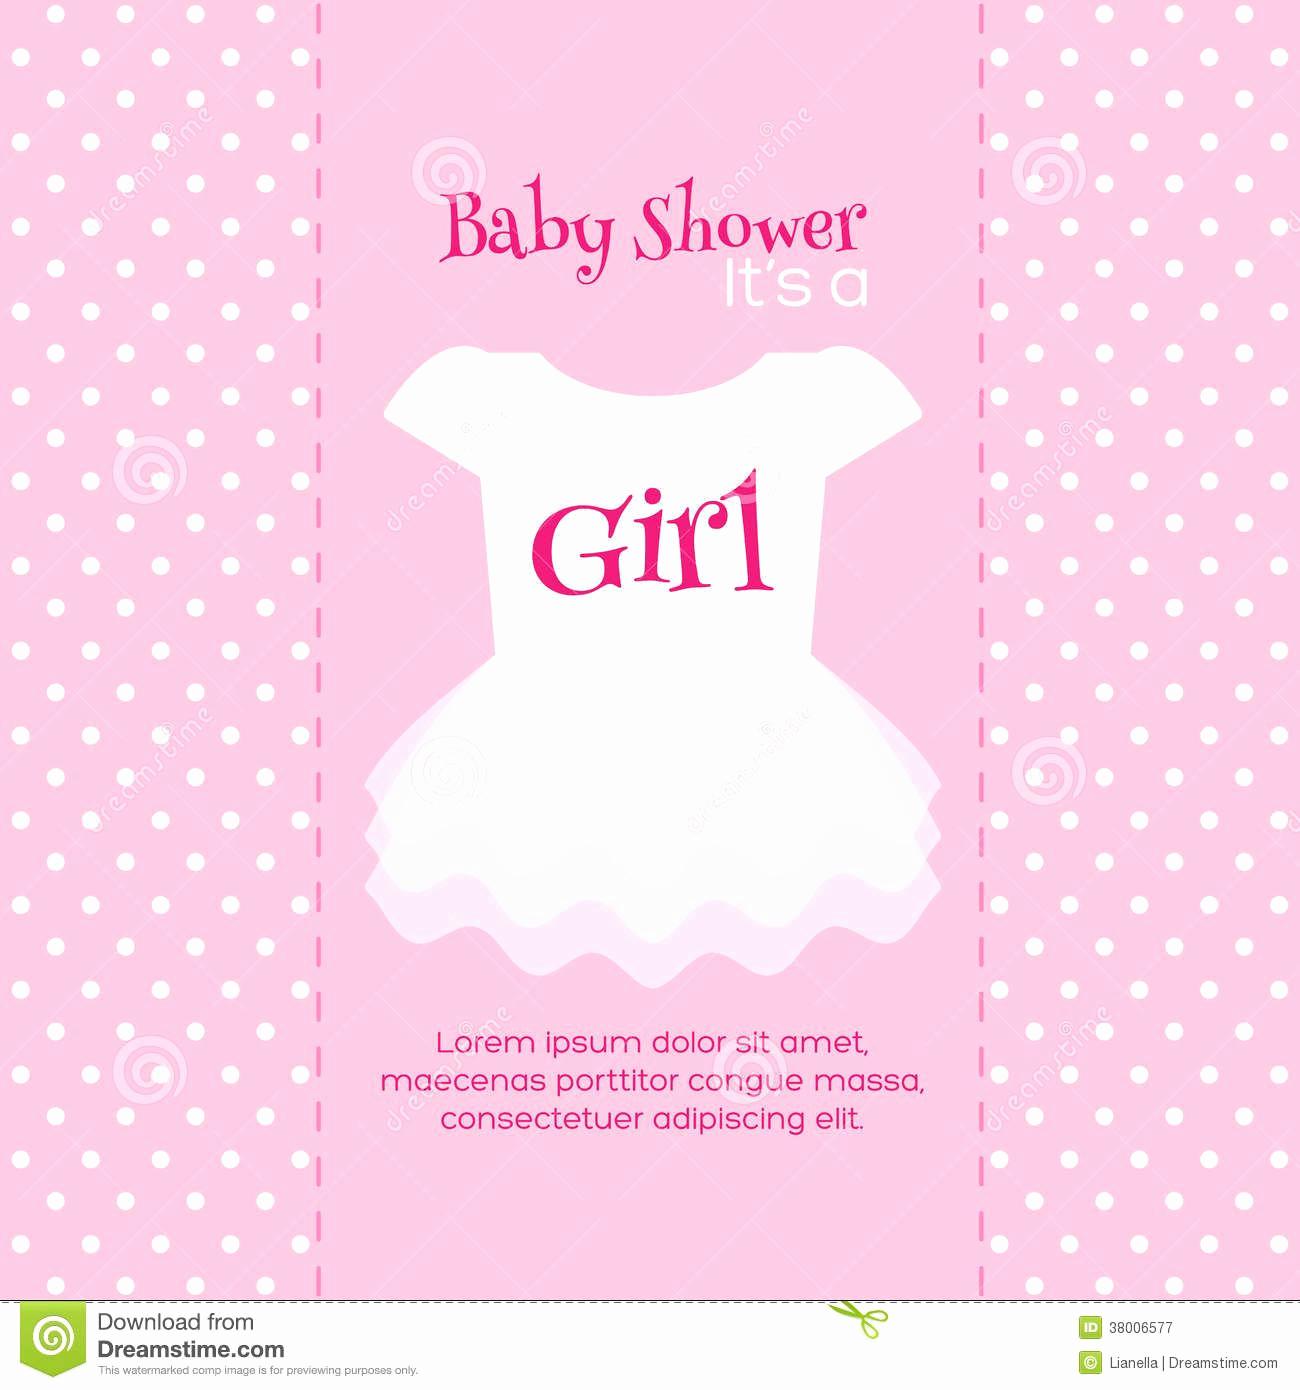 Baby Shower Invitation Ideas Girl Best Of Design Free Printable Baby Shower Invitations for Girls